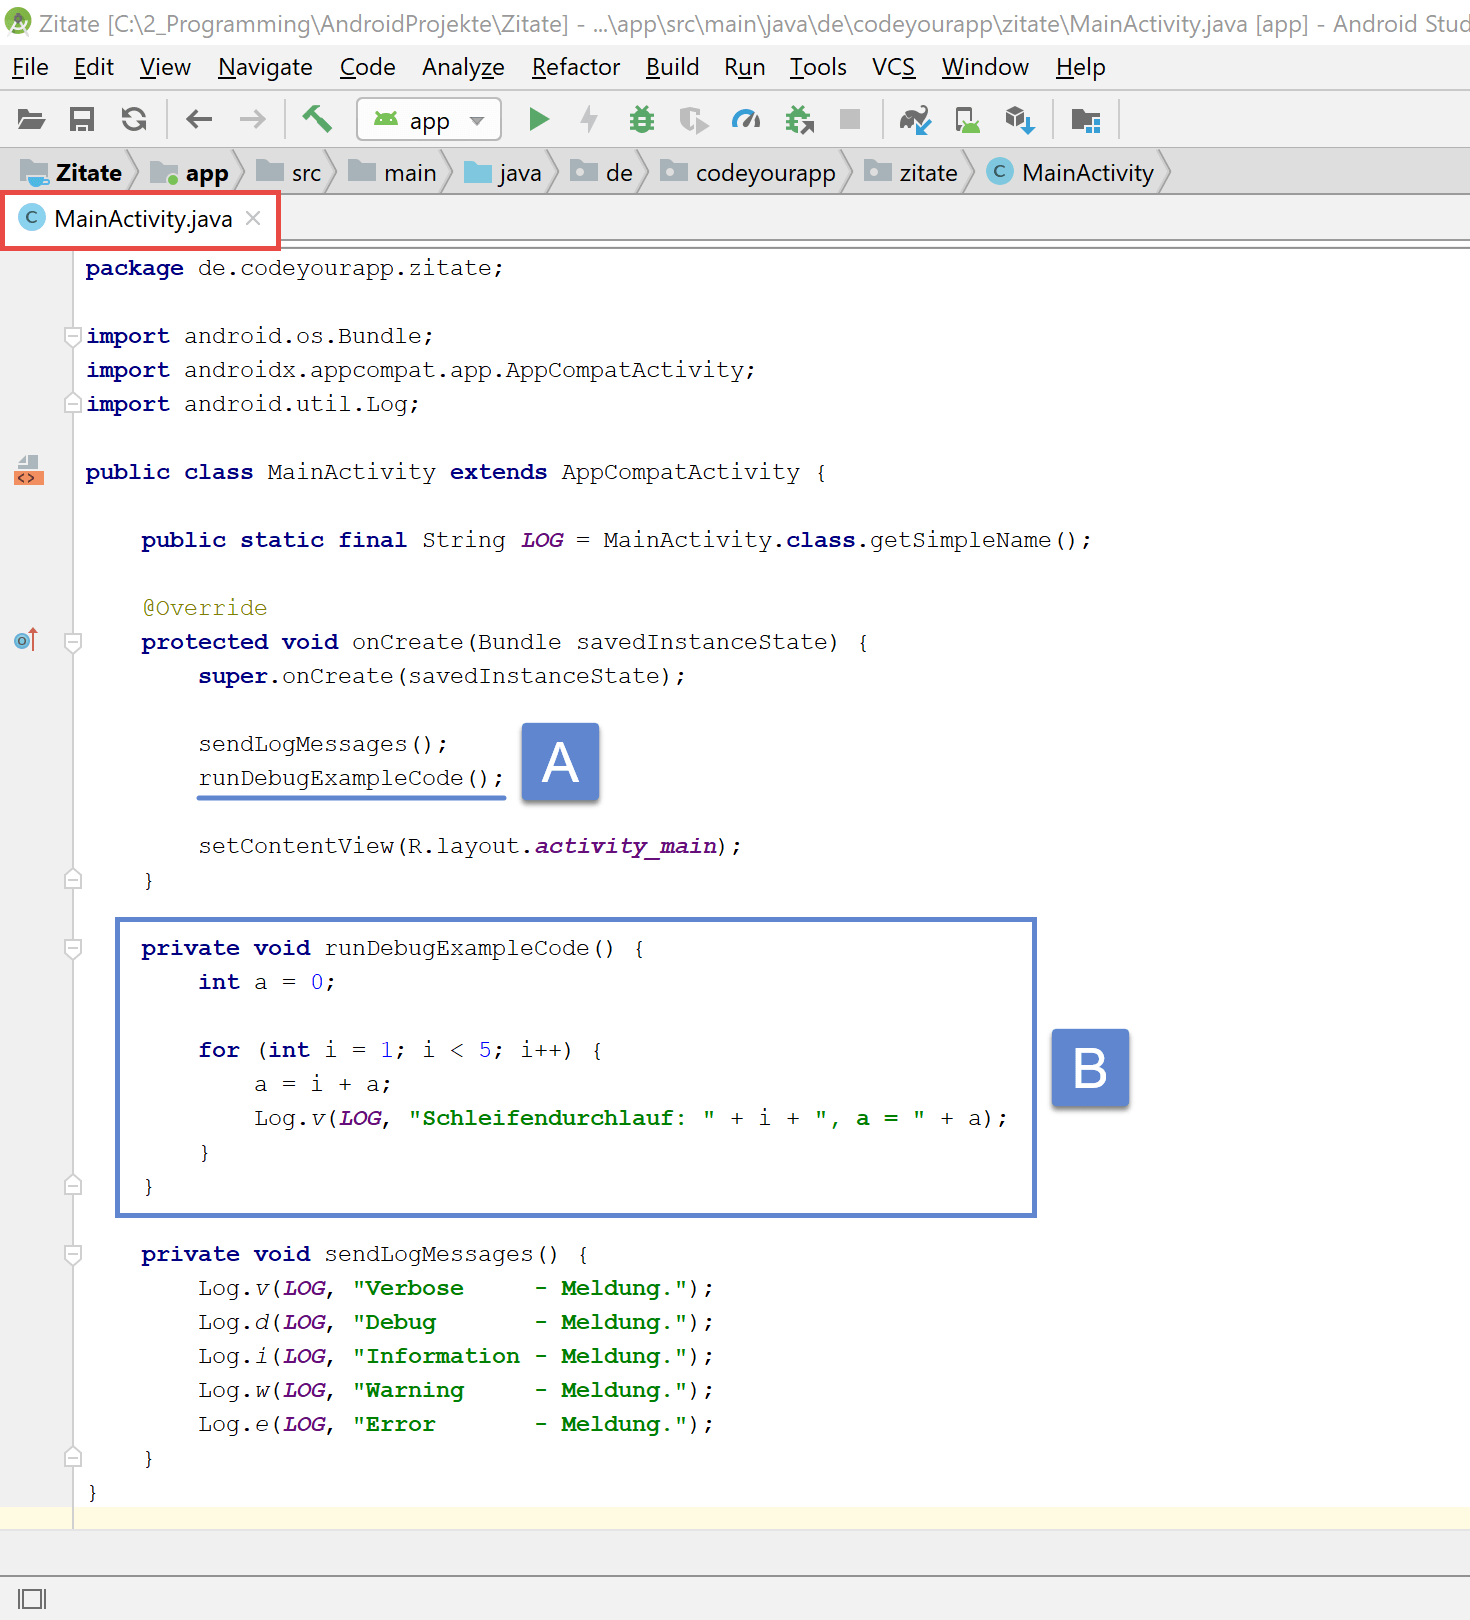 debugging_example_code